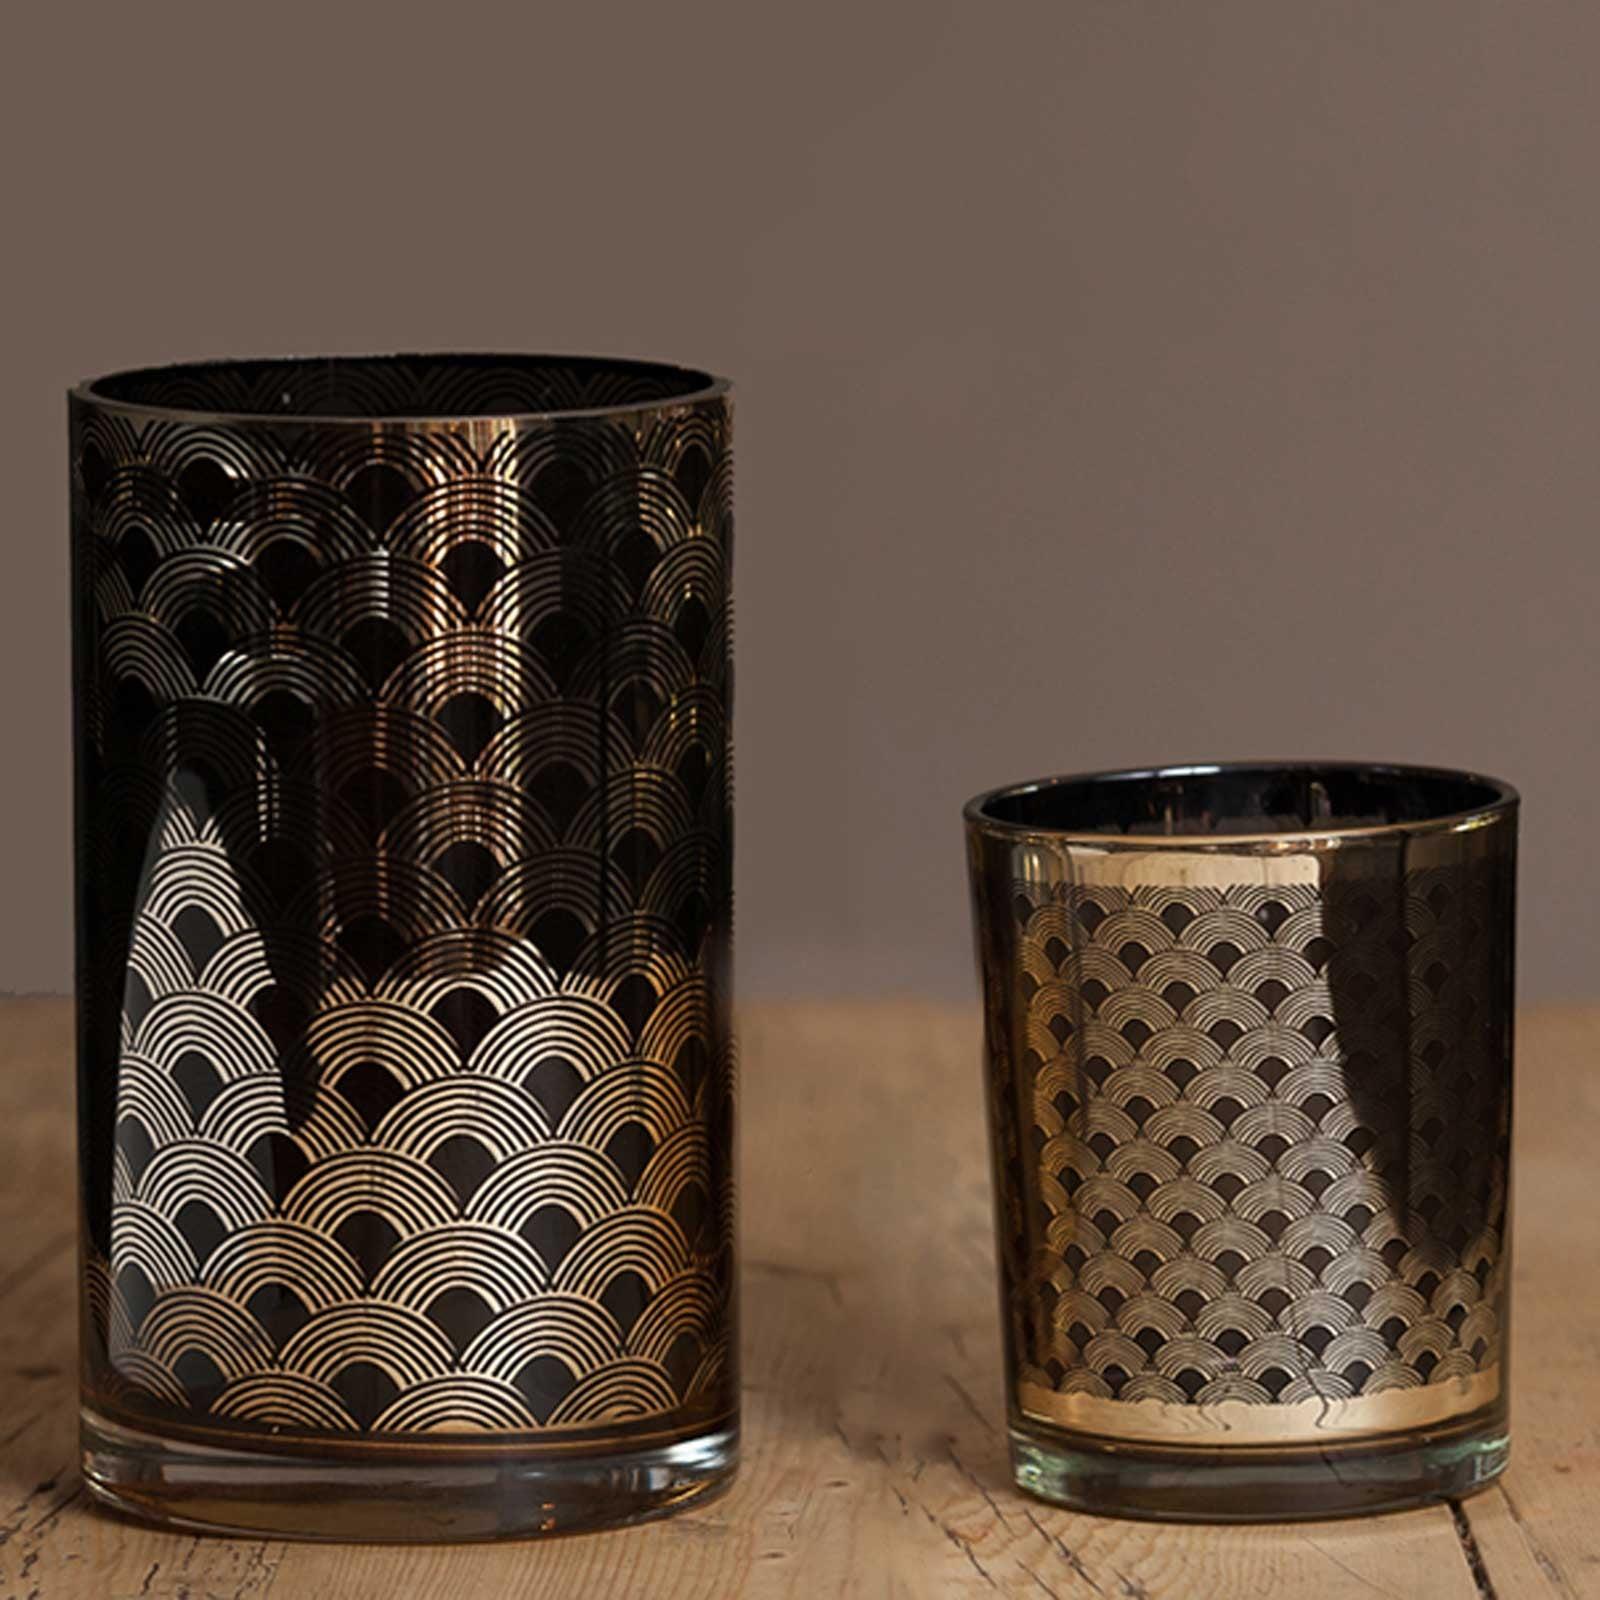 Black Gold Glass Candle Holders Harrod Horticultural